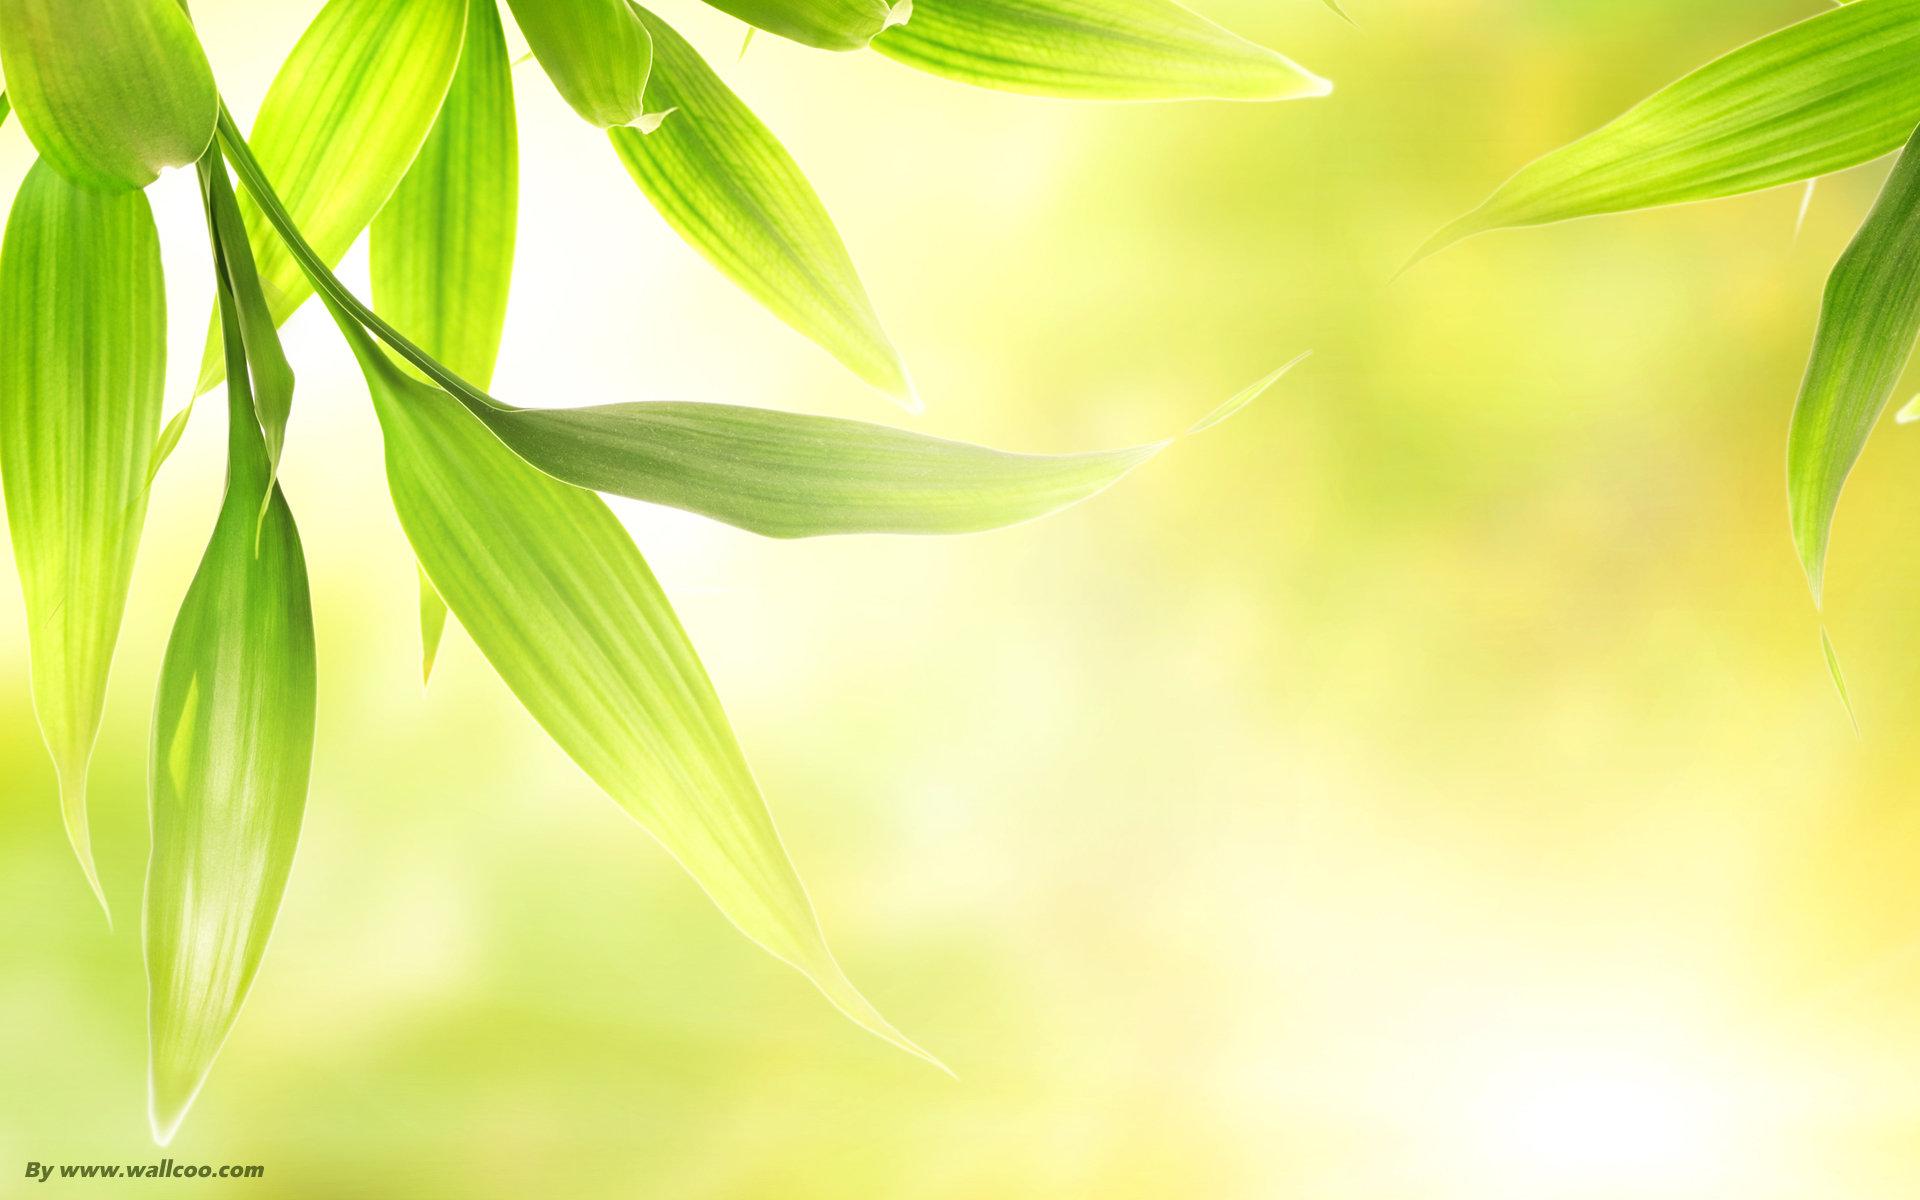 Leaves Best Wallpaper Picture v920i   ARASPOTcom 1920x1200